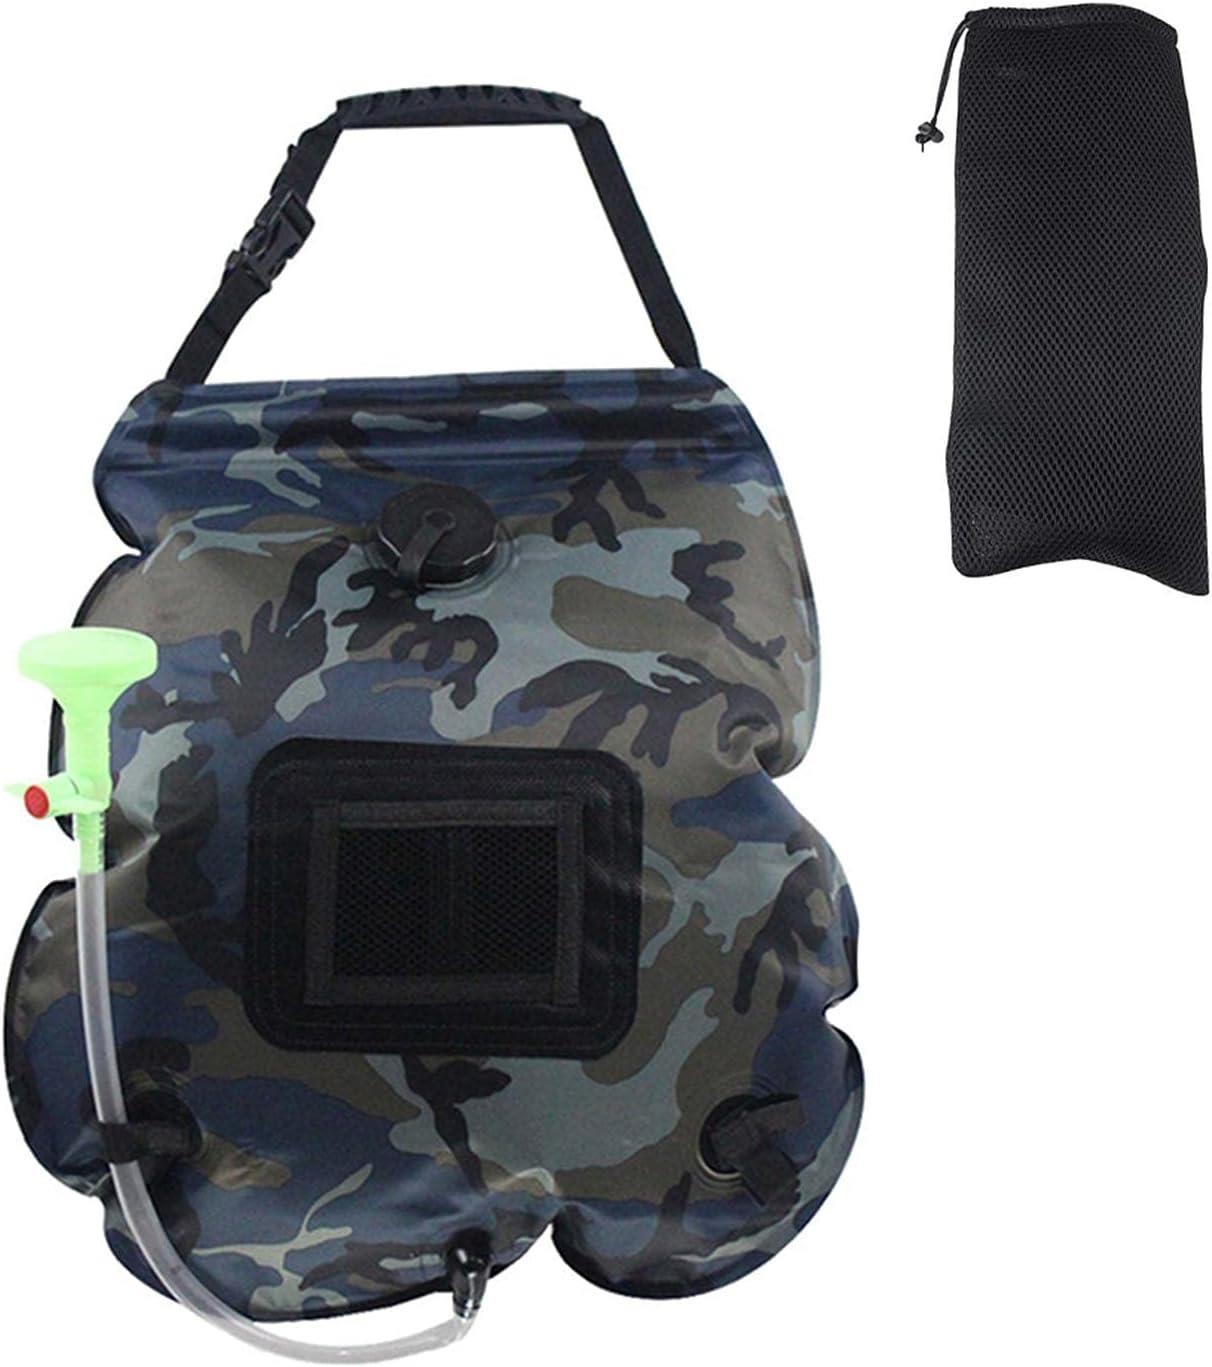 DENPETEC Shower Sacramento Mall Bag Camping Solar Popular brand in the world Portable